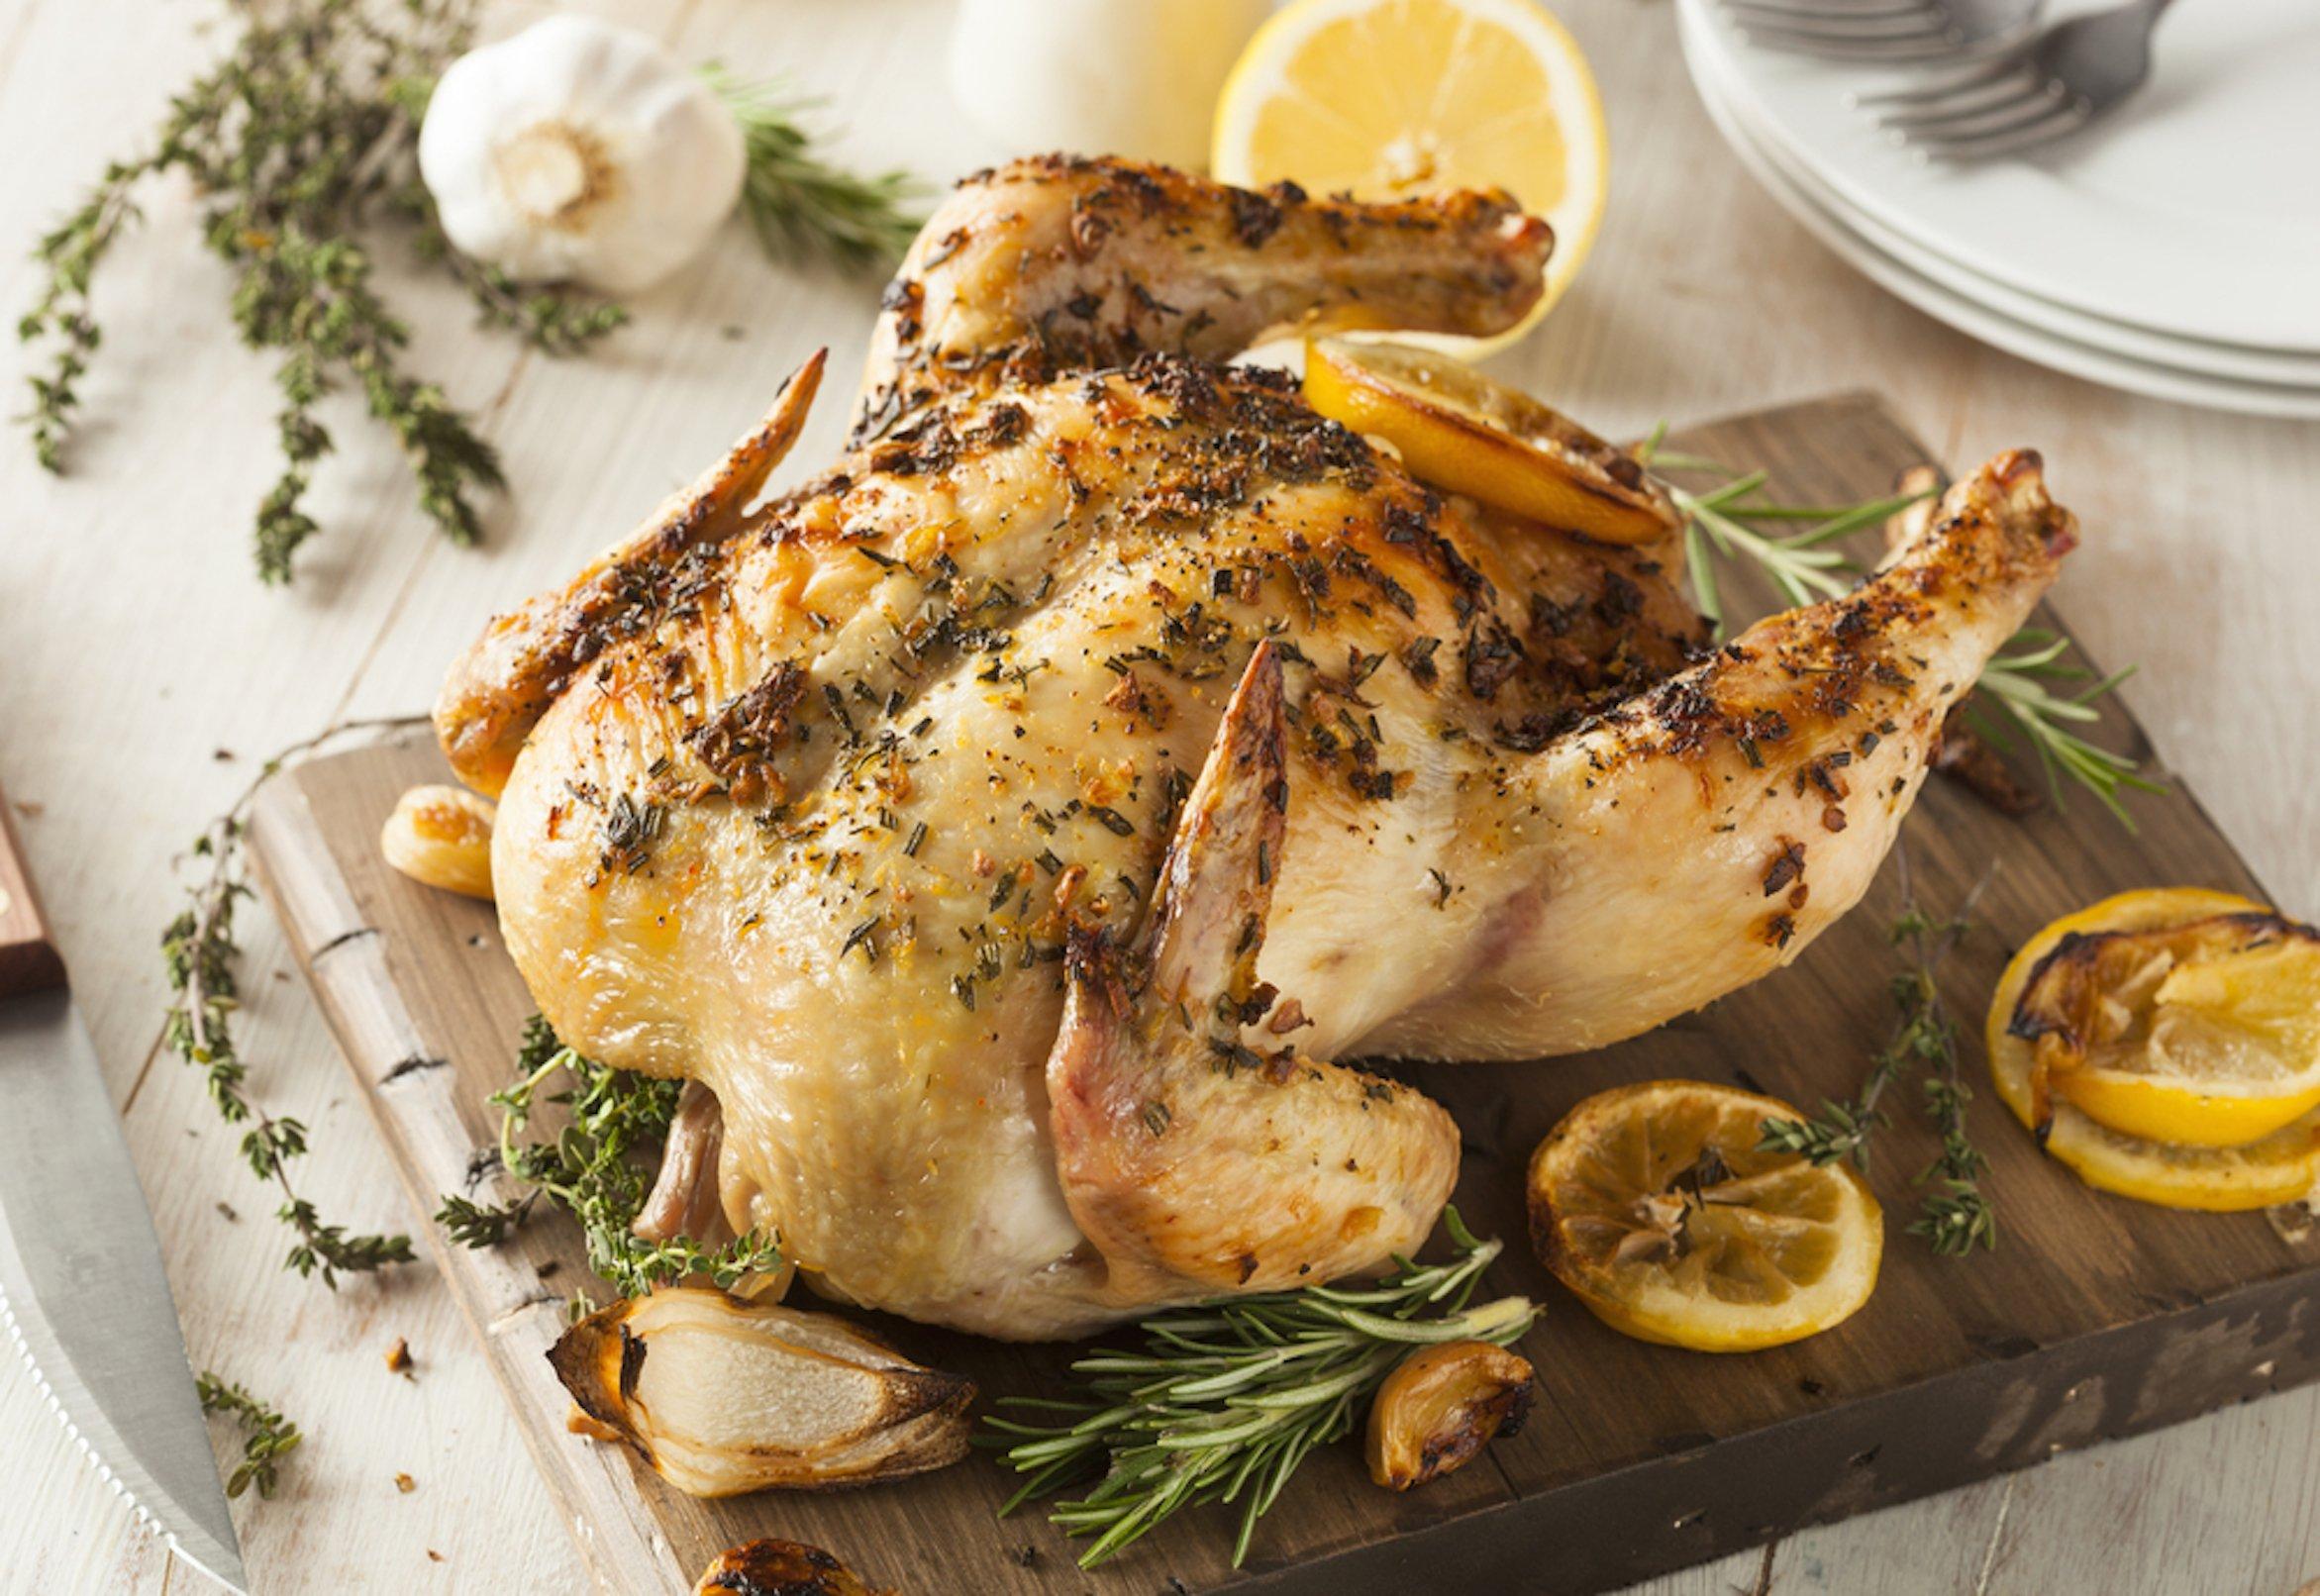 ... roasted chicken garlic roasted garlic slow roasted garlic and lemon